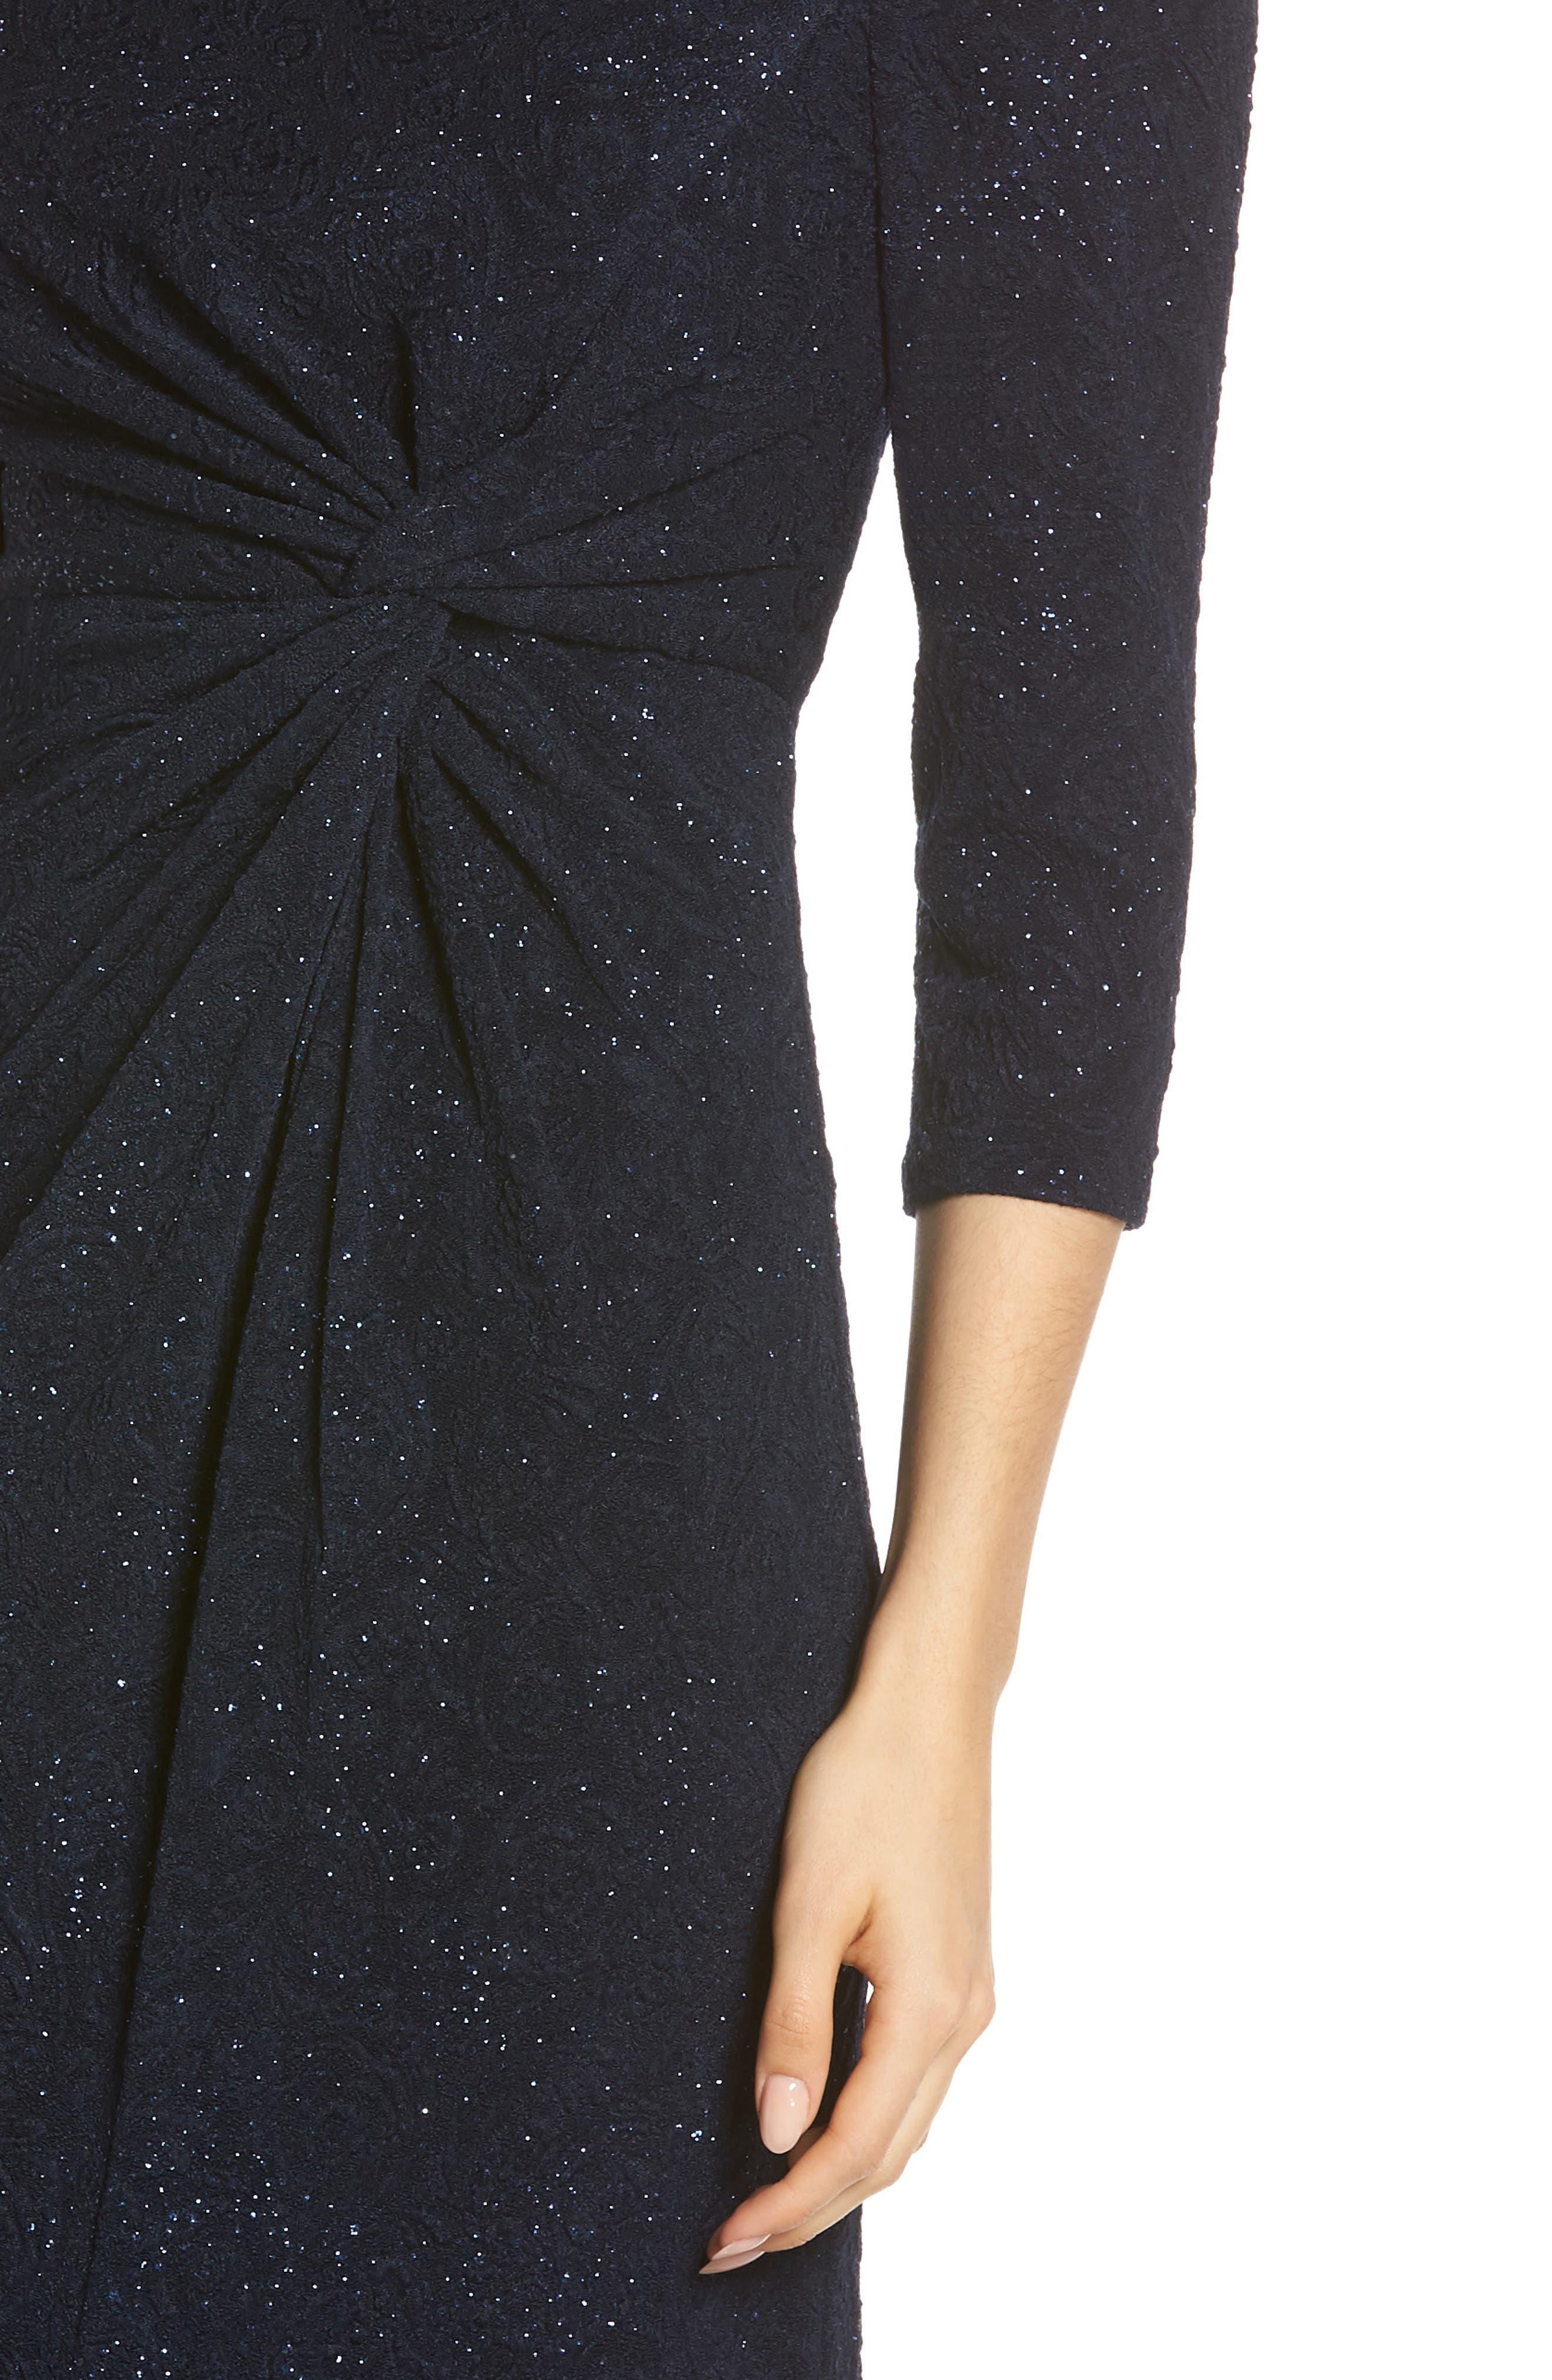 ALEX EVENINGS, Knot Front Sequin Jacquard Evening Dress, Alternate thumbnail 5, color, NAVY